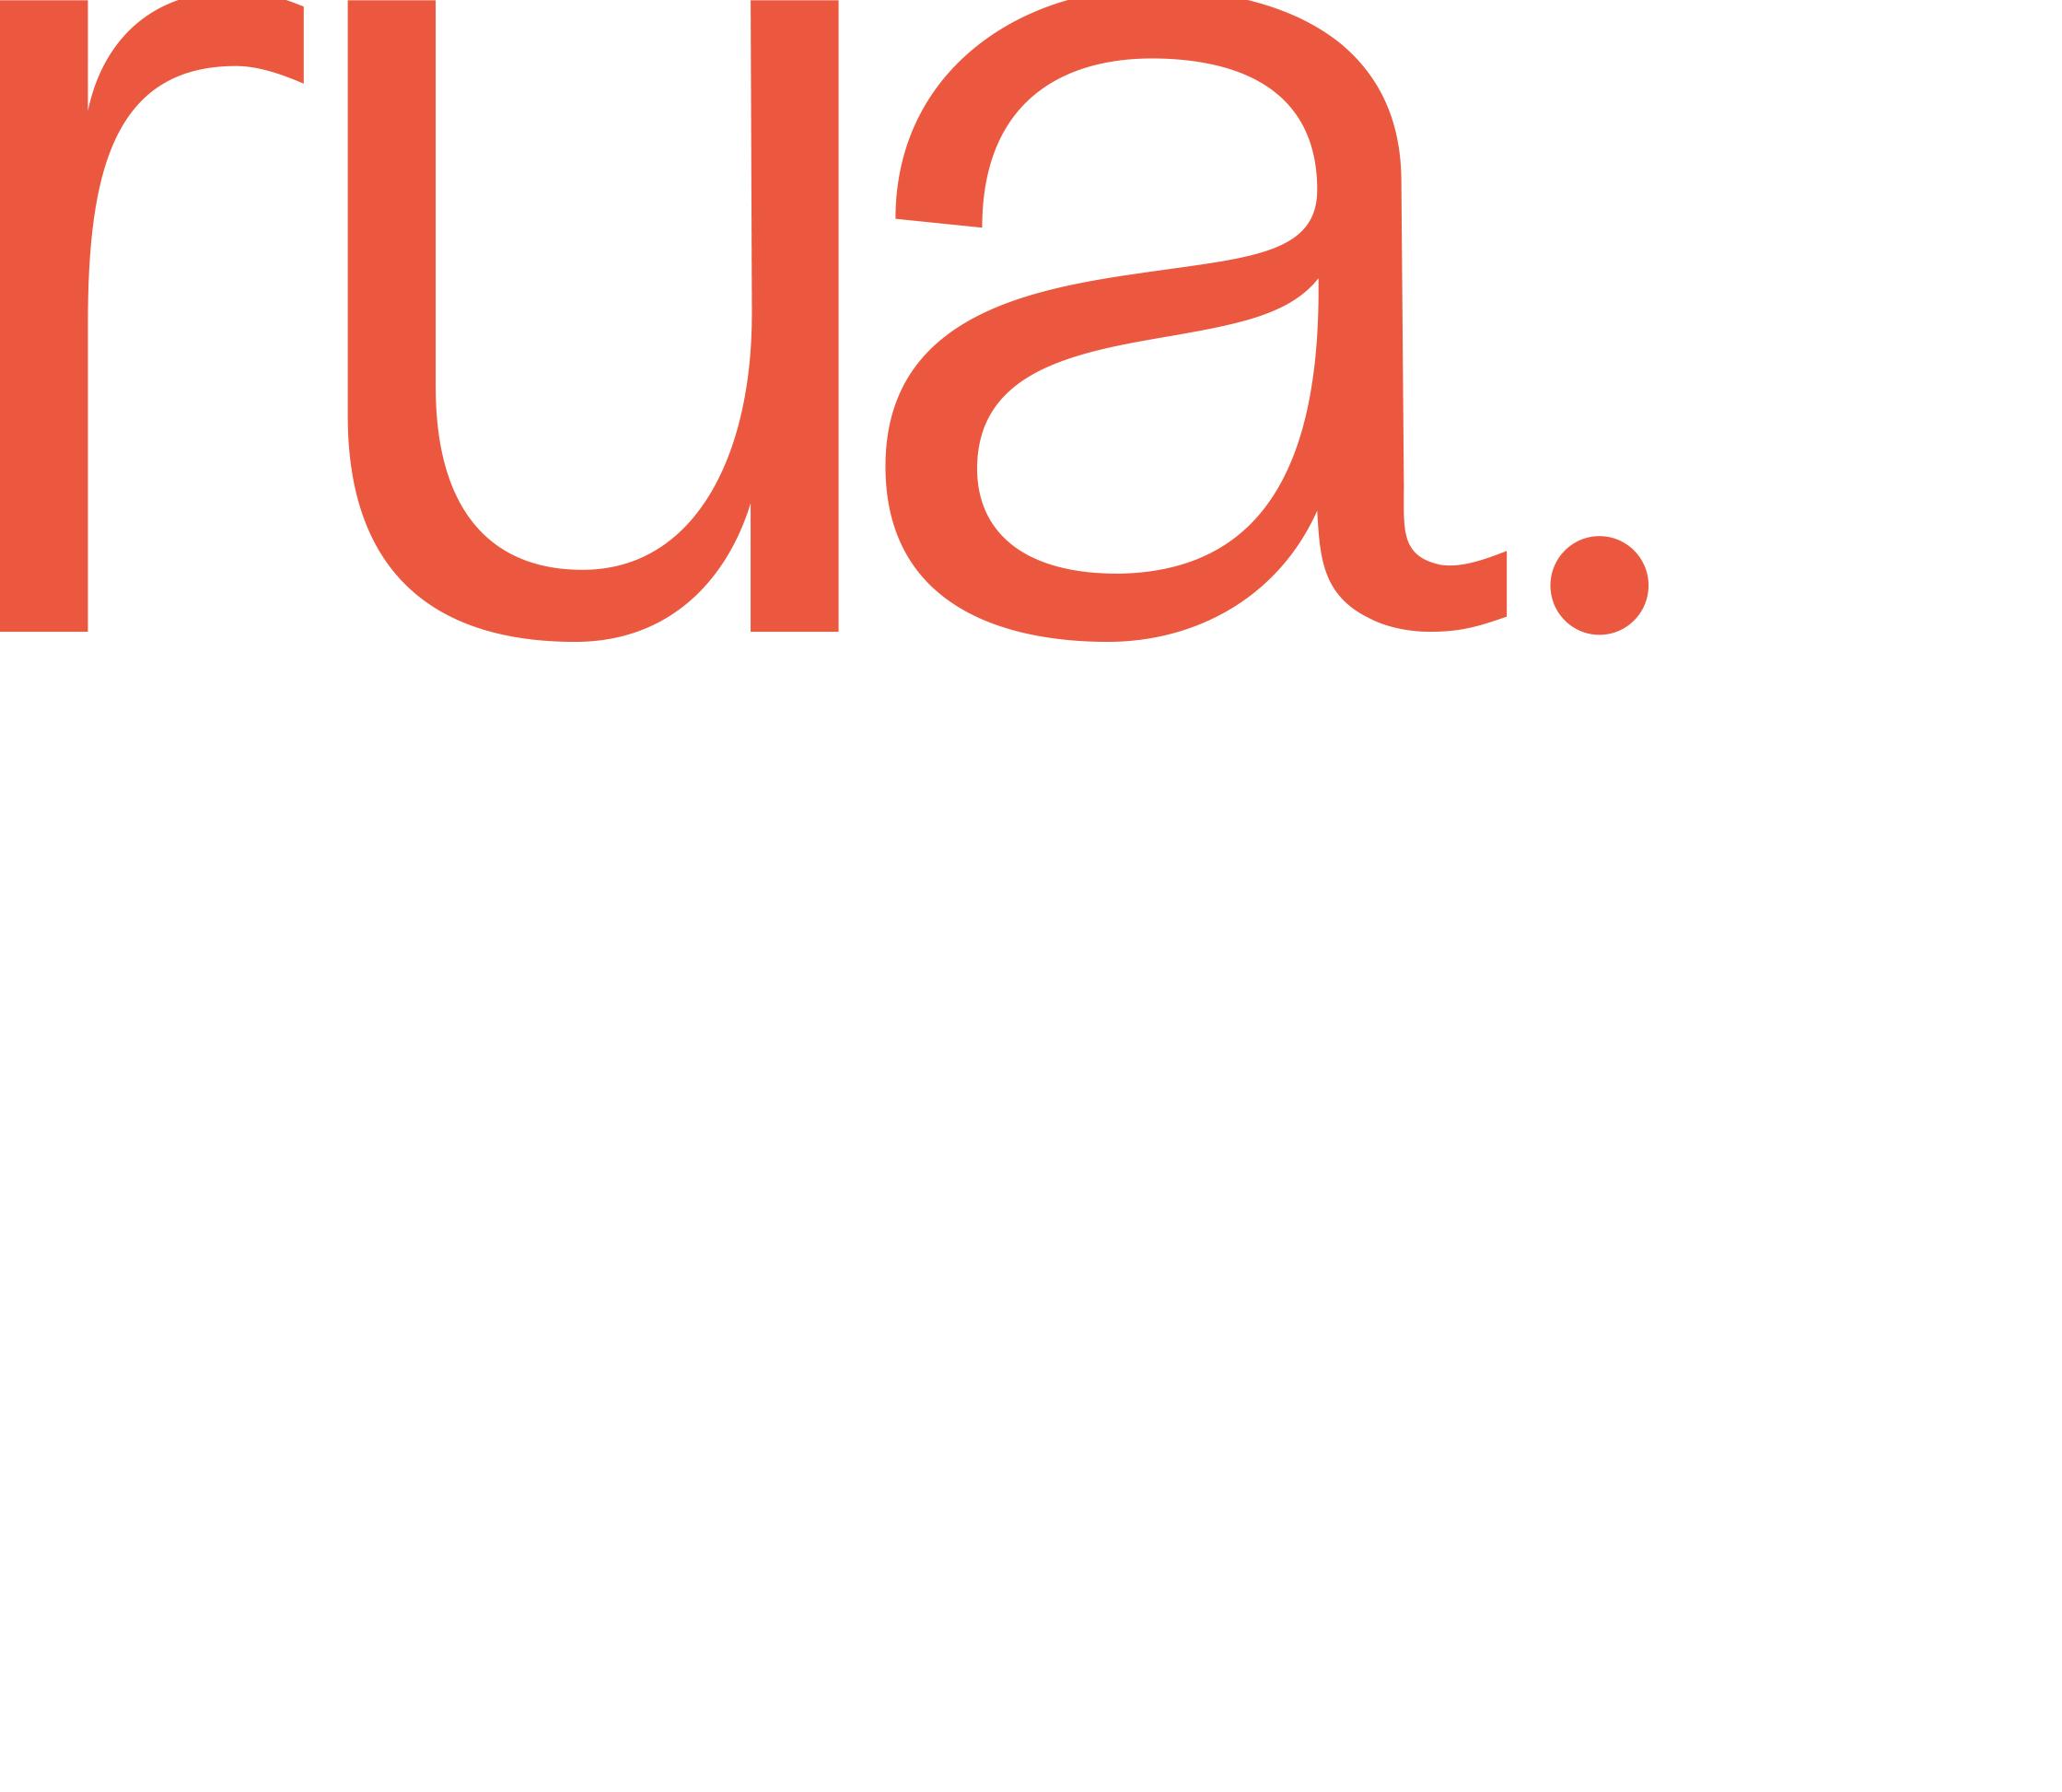 rua_Logo.jpg